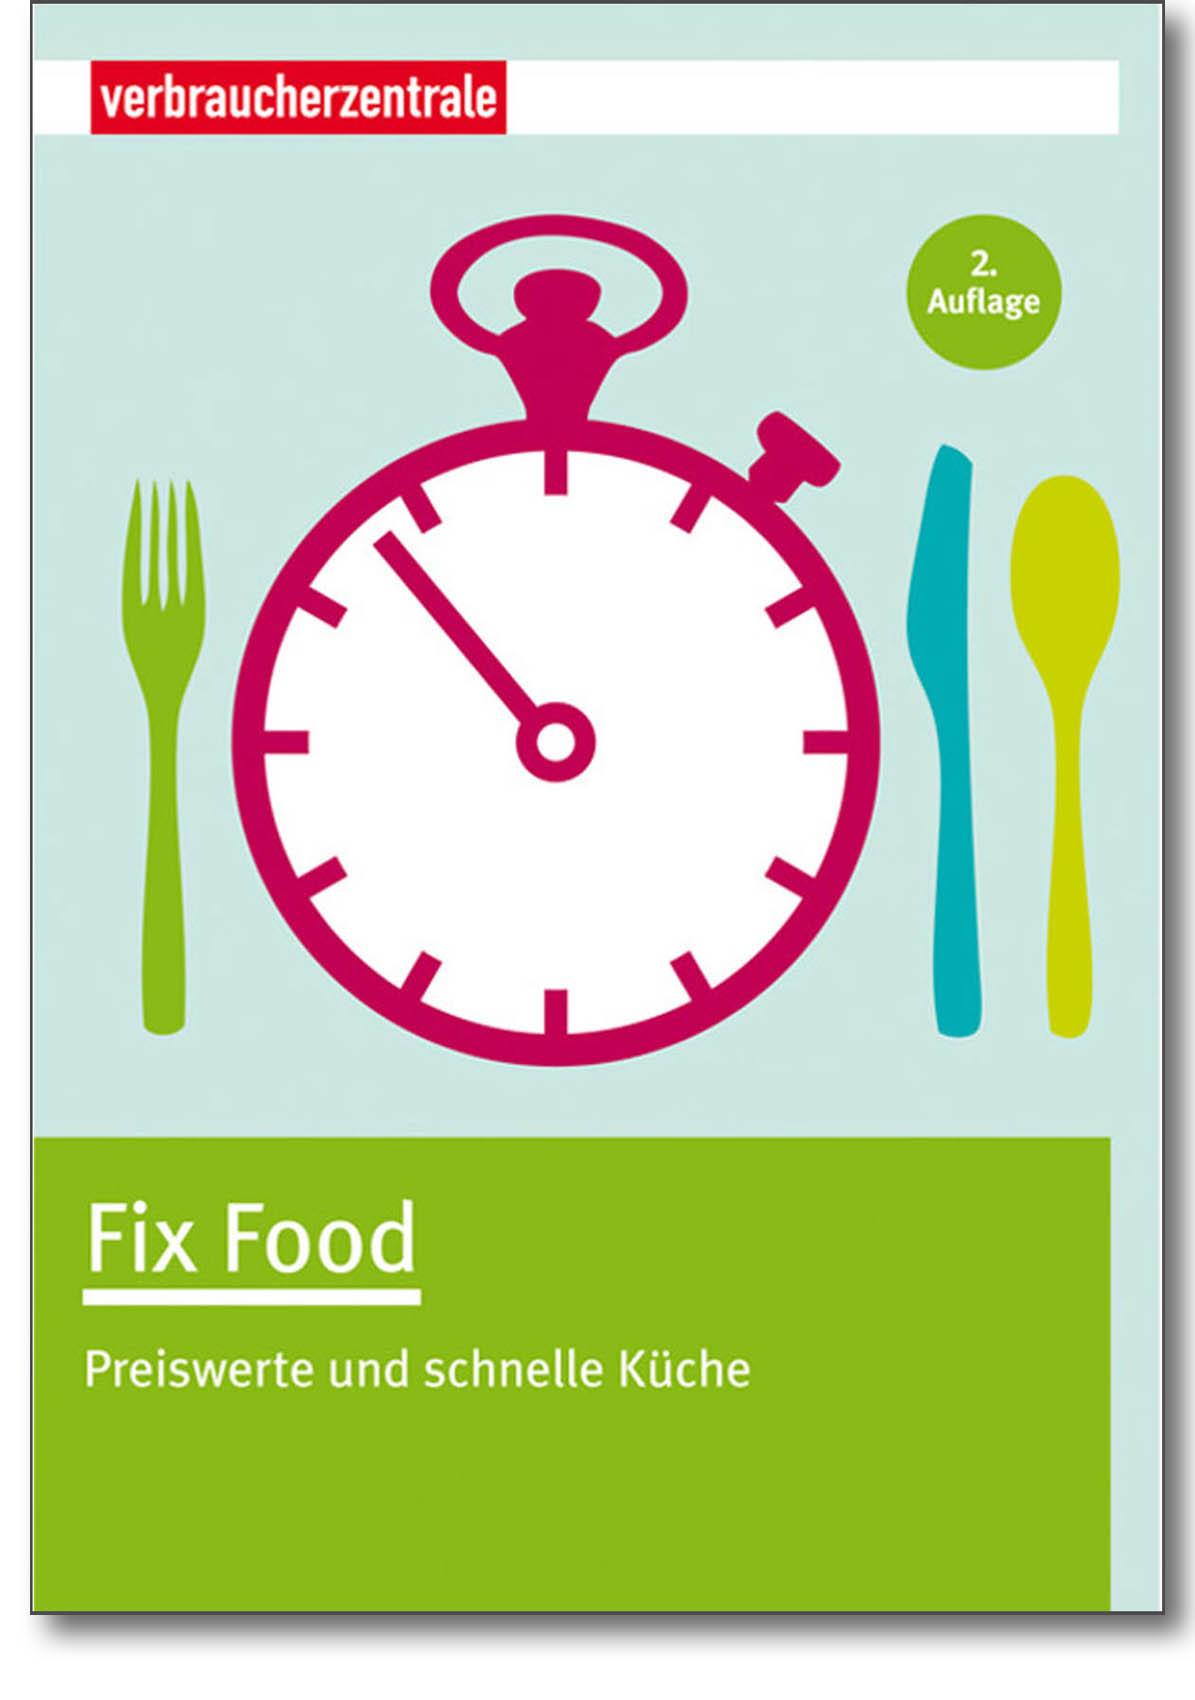 Buch - Fix Food - Verbraucherzentrale